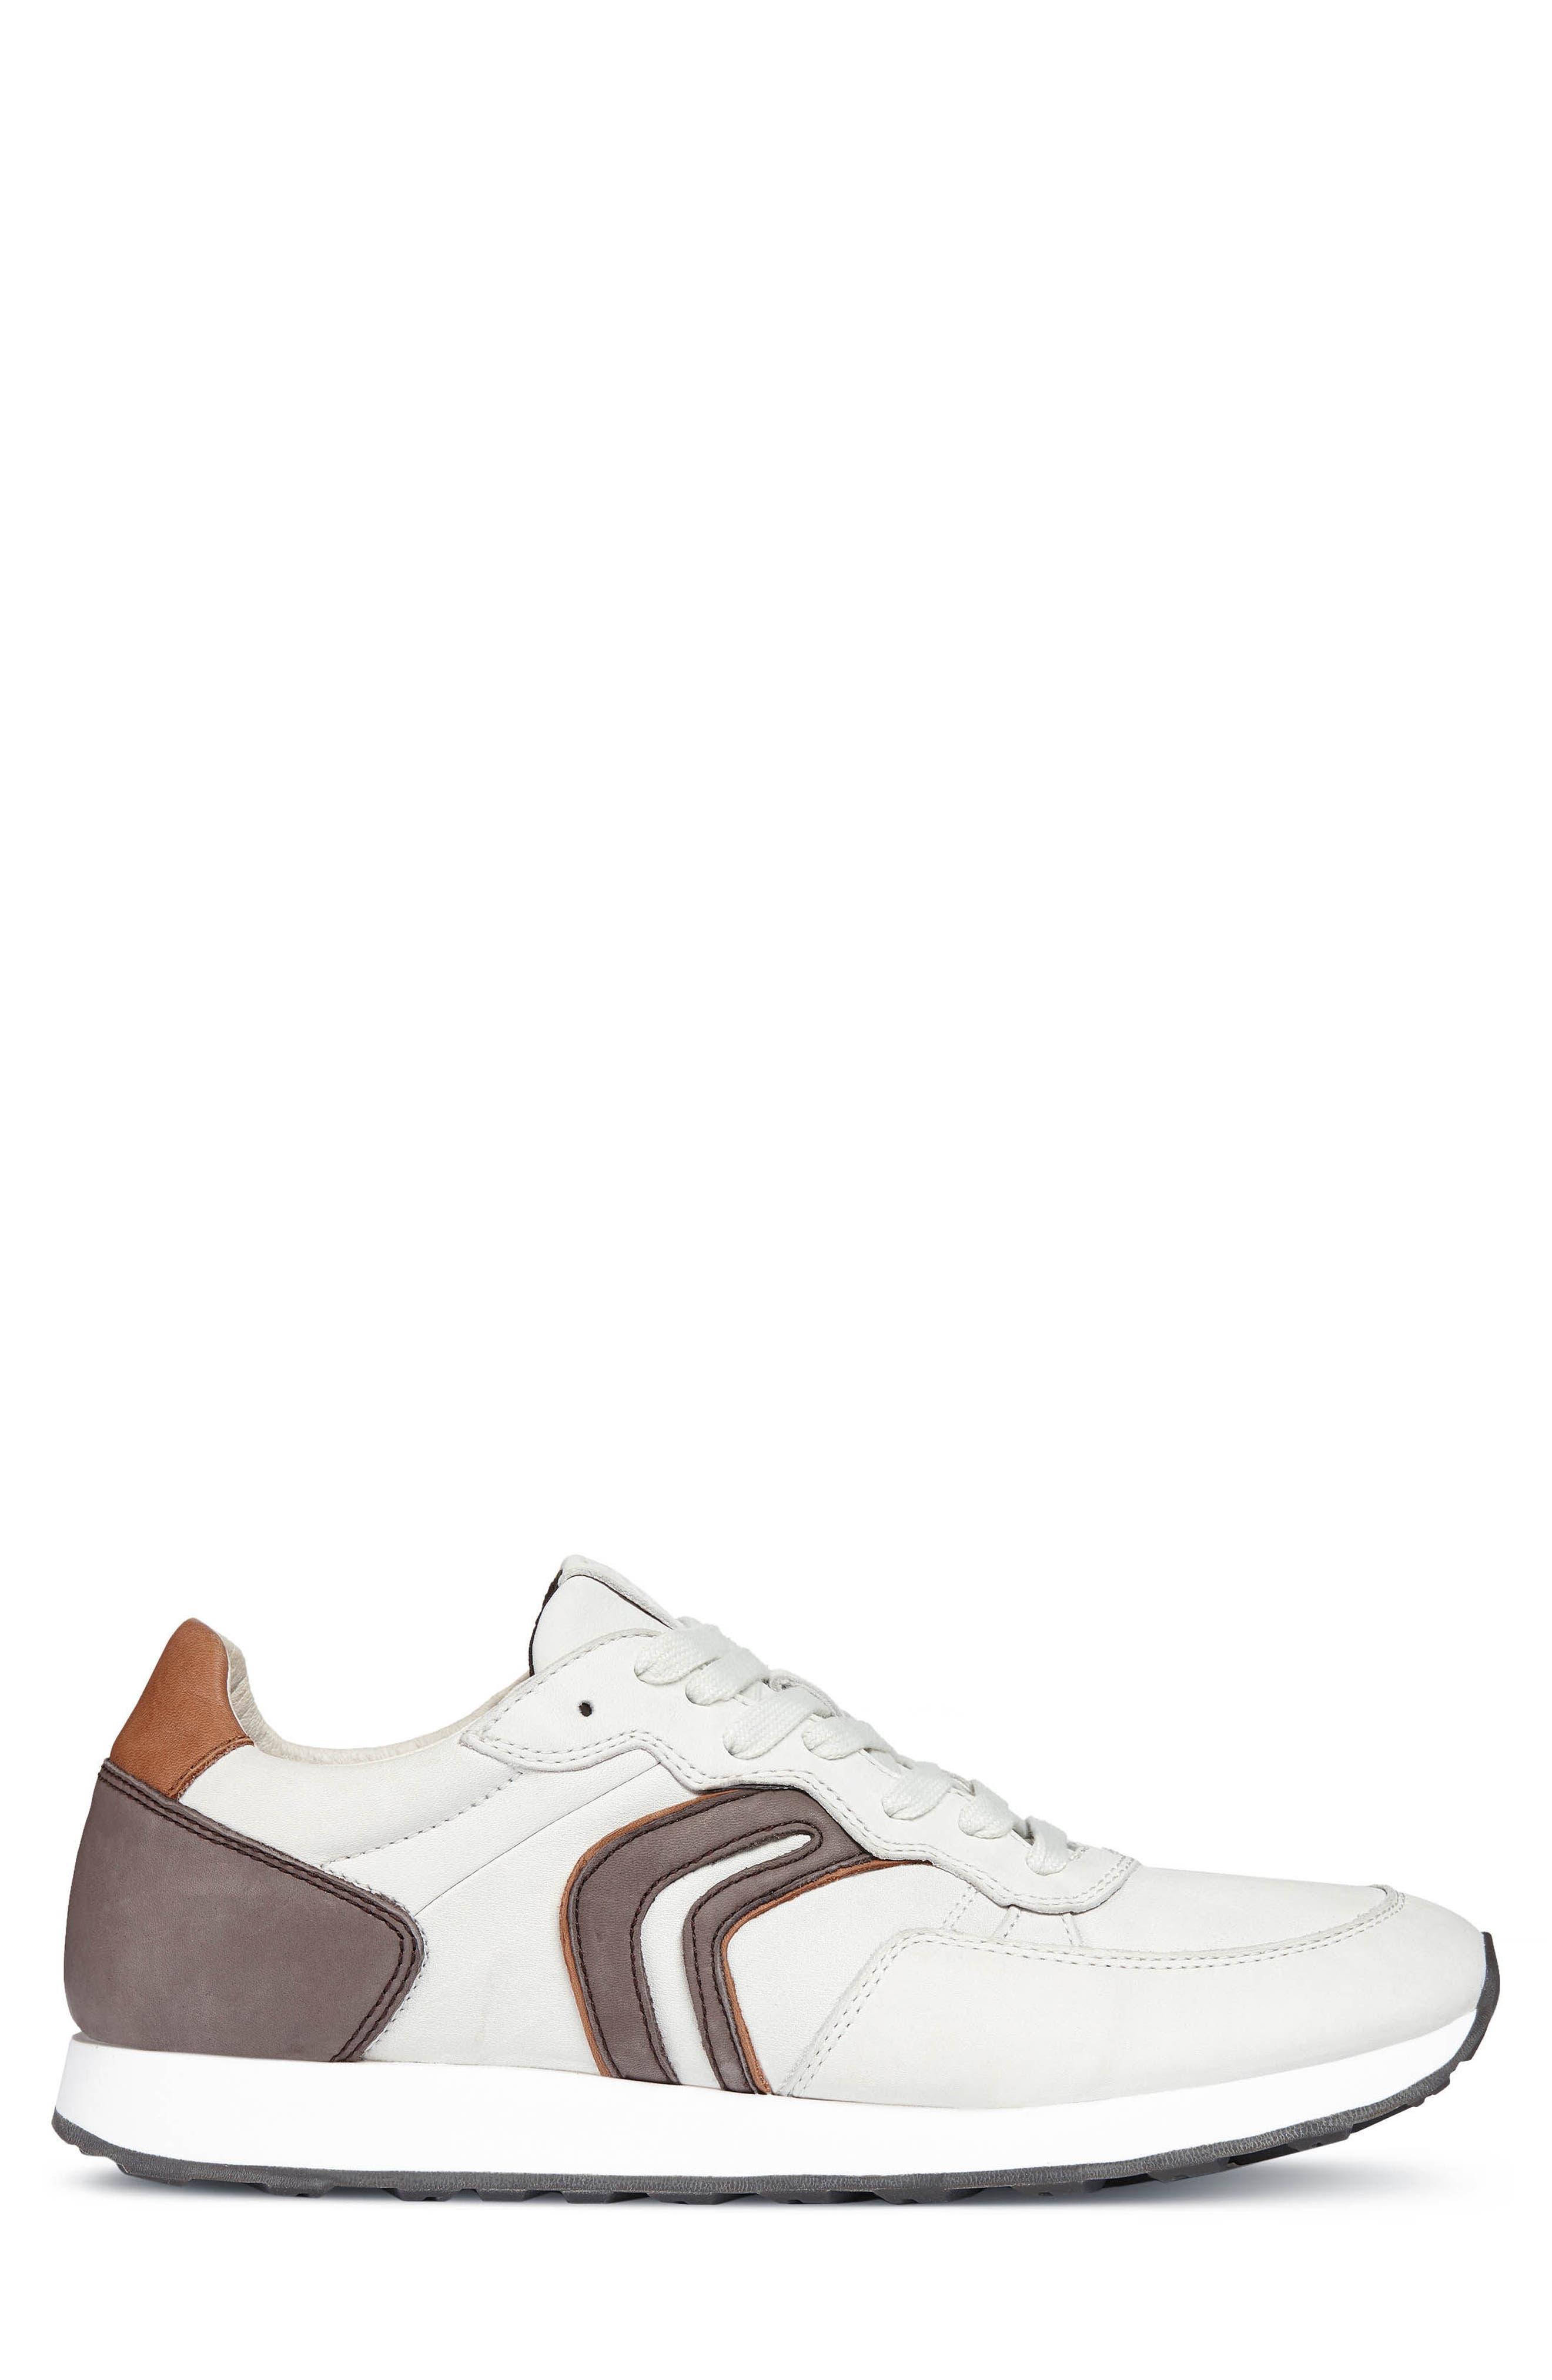 Vincint 1 Sneaker,                             Alternate thumbnail 3, color,                             WHITE/ DARK COFFEE LEATHER